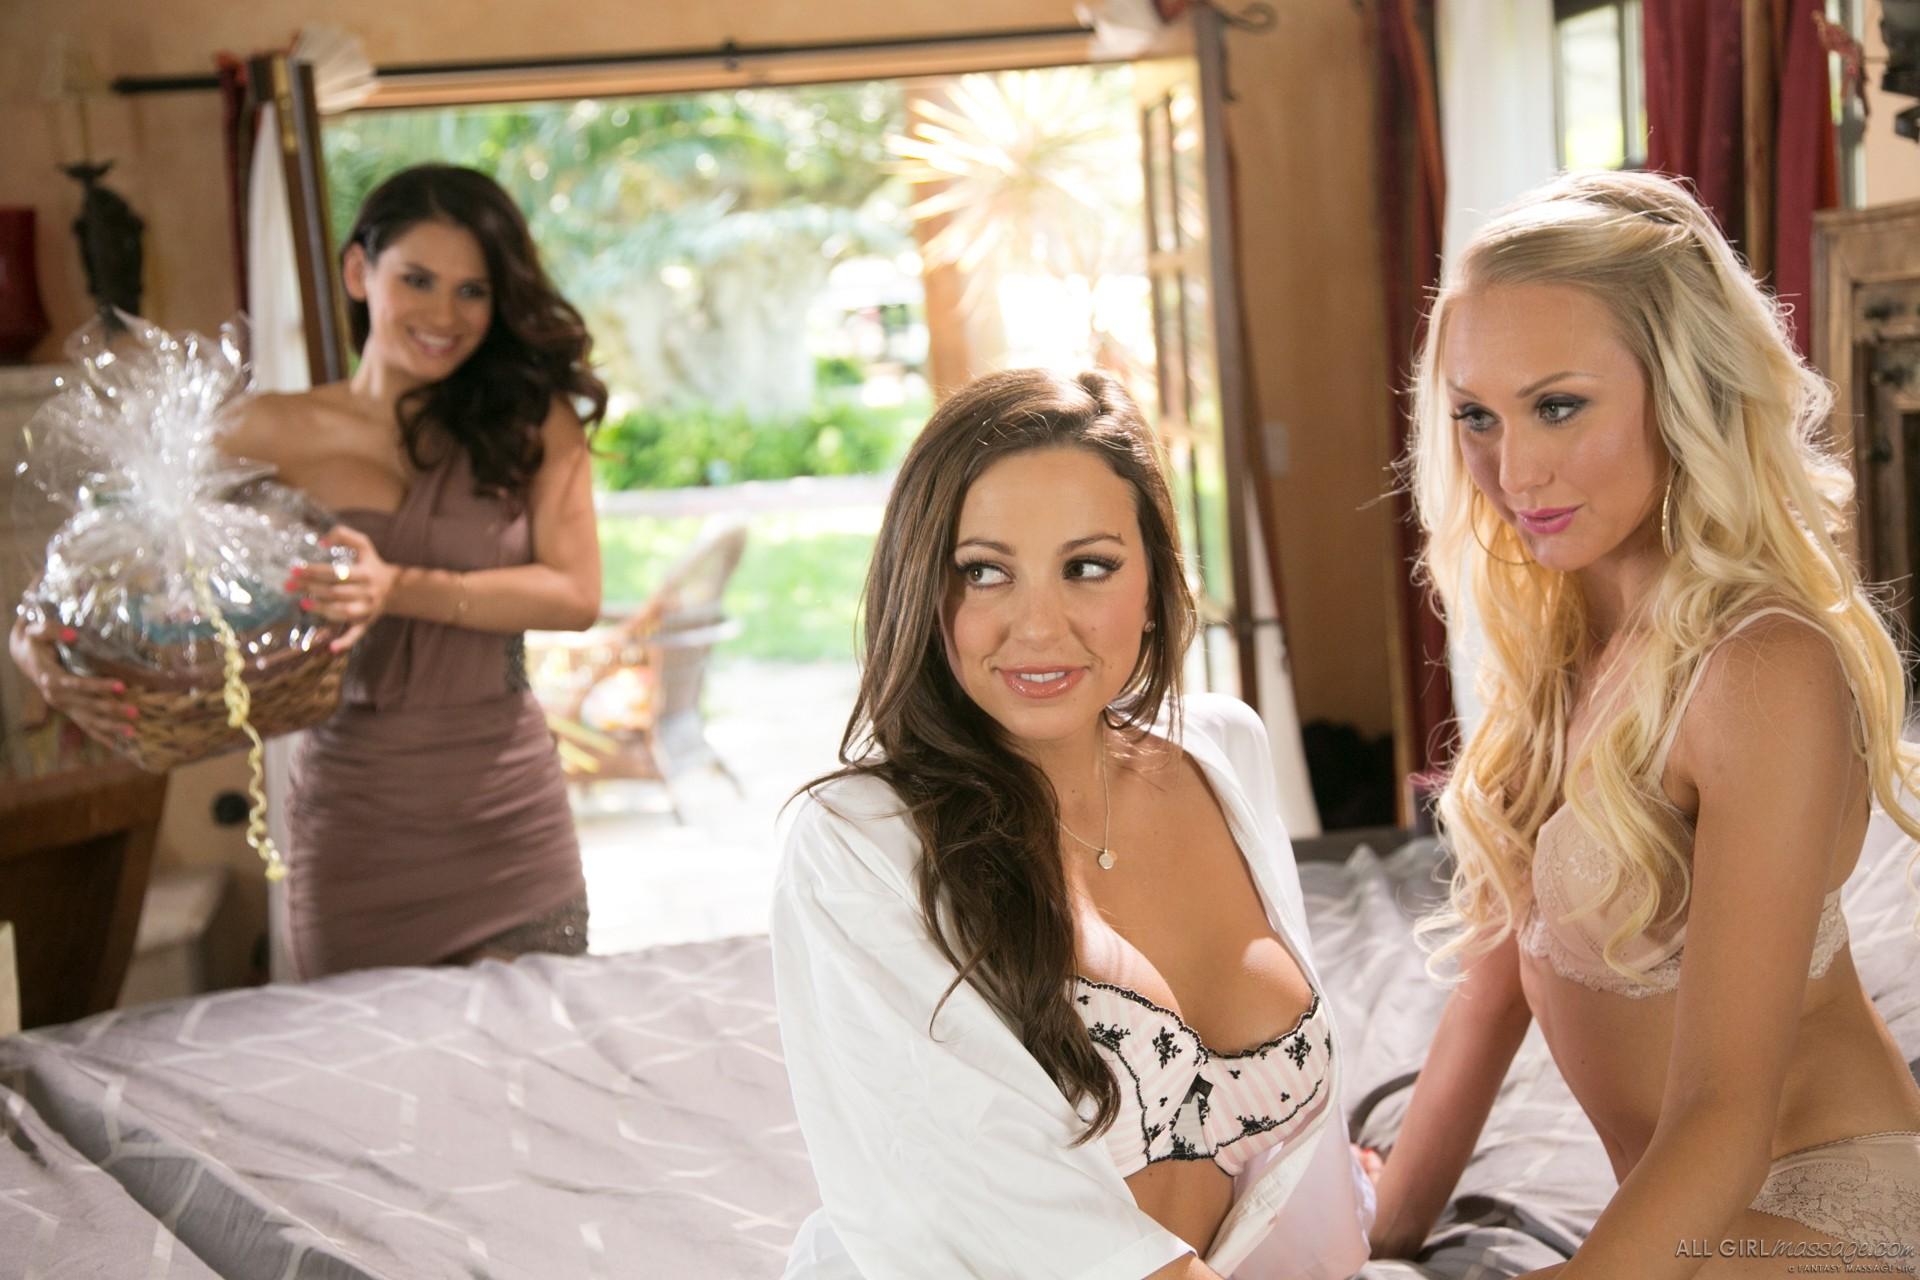 Vanessa Veracruz, Natasha Voya, Abigail Mac - Секс втроем - Галерея № 3519306